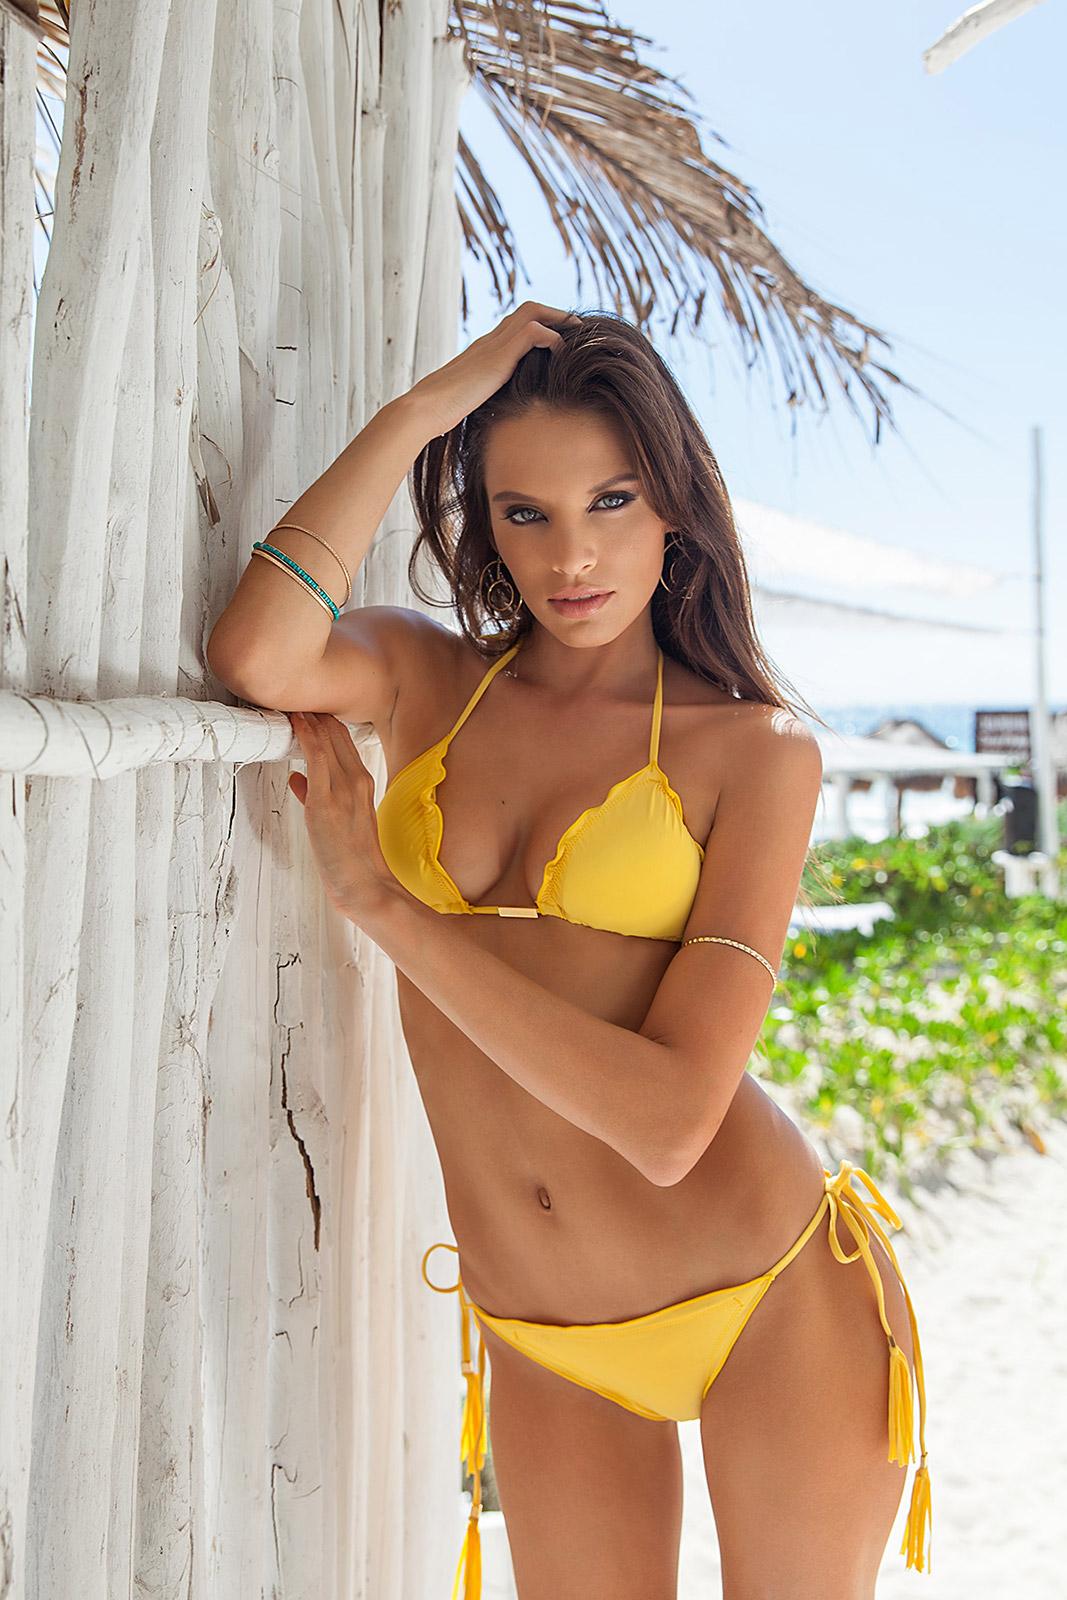 a18c5ca236 AMBRA FRUFRU MELON  Yellow scrunch Bikini with bubbles and undulated edges.